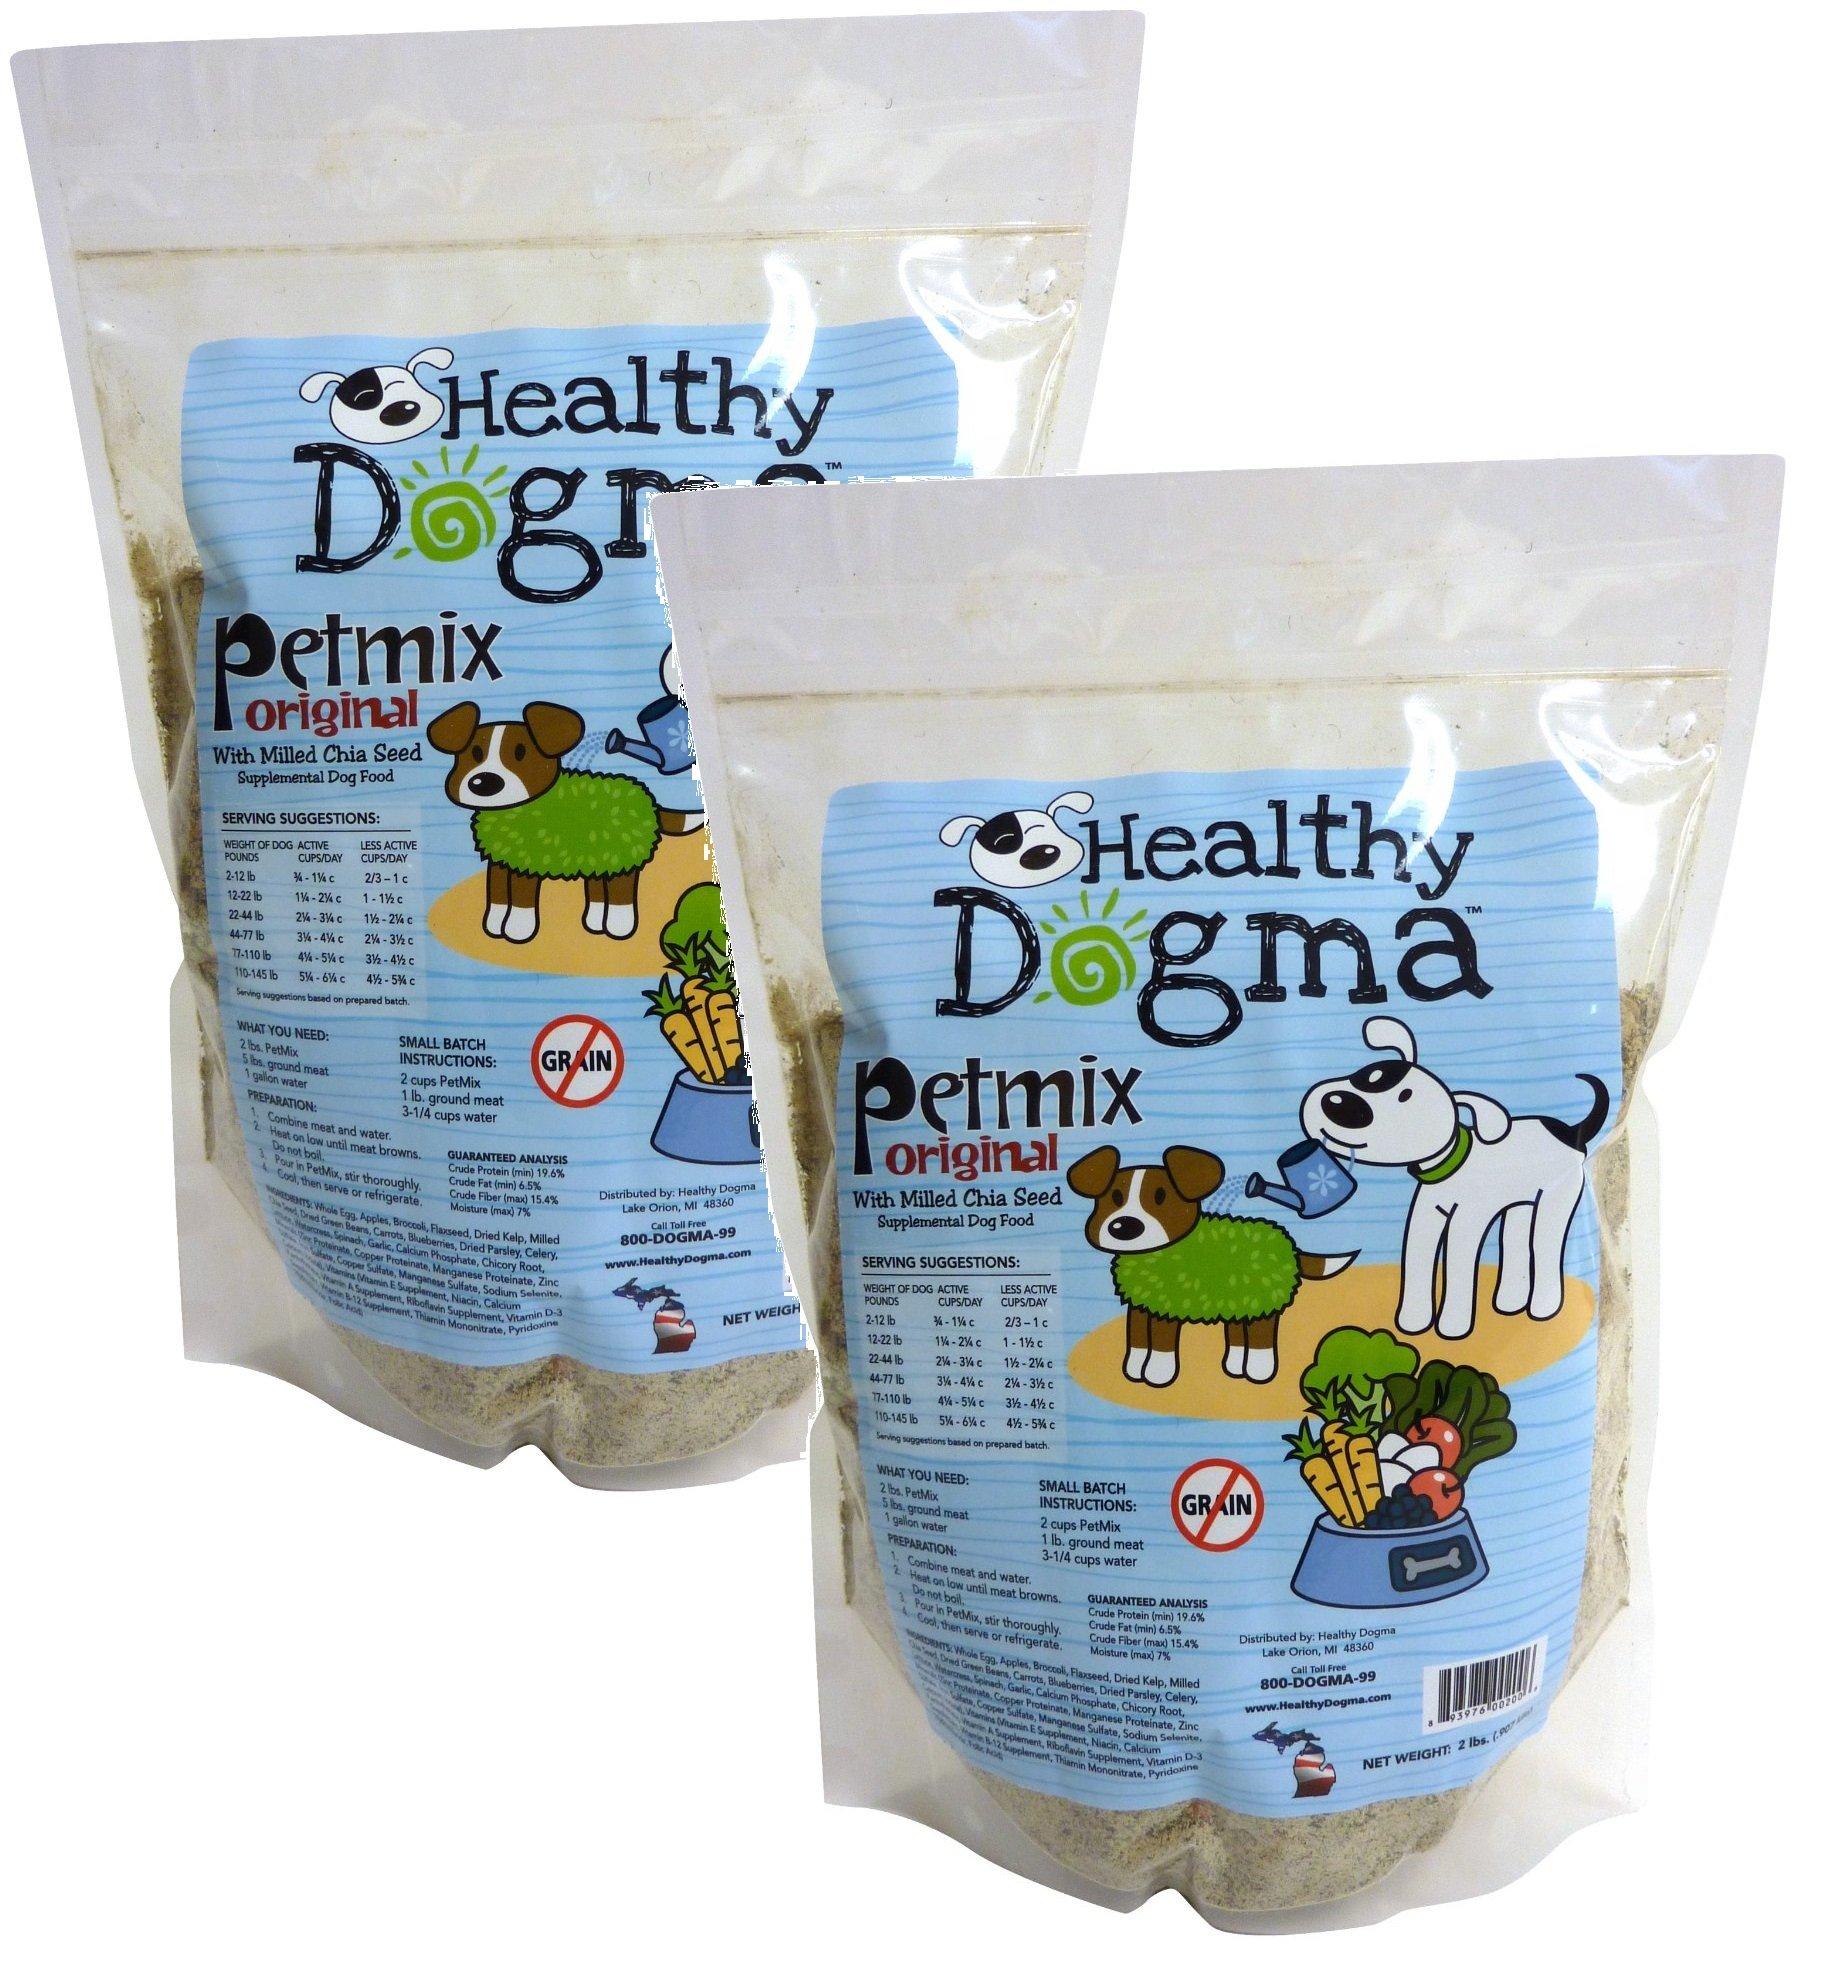 Healthy Dogma PetMix Original Dog Food, 2-Pound Bag (2 Pack) by Healthy Dogma